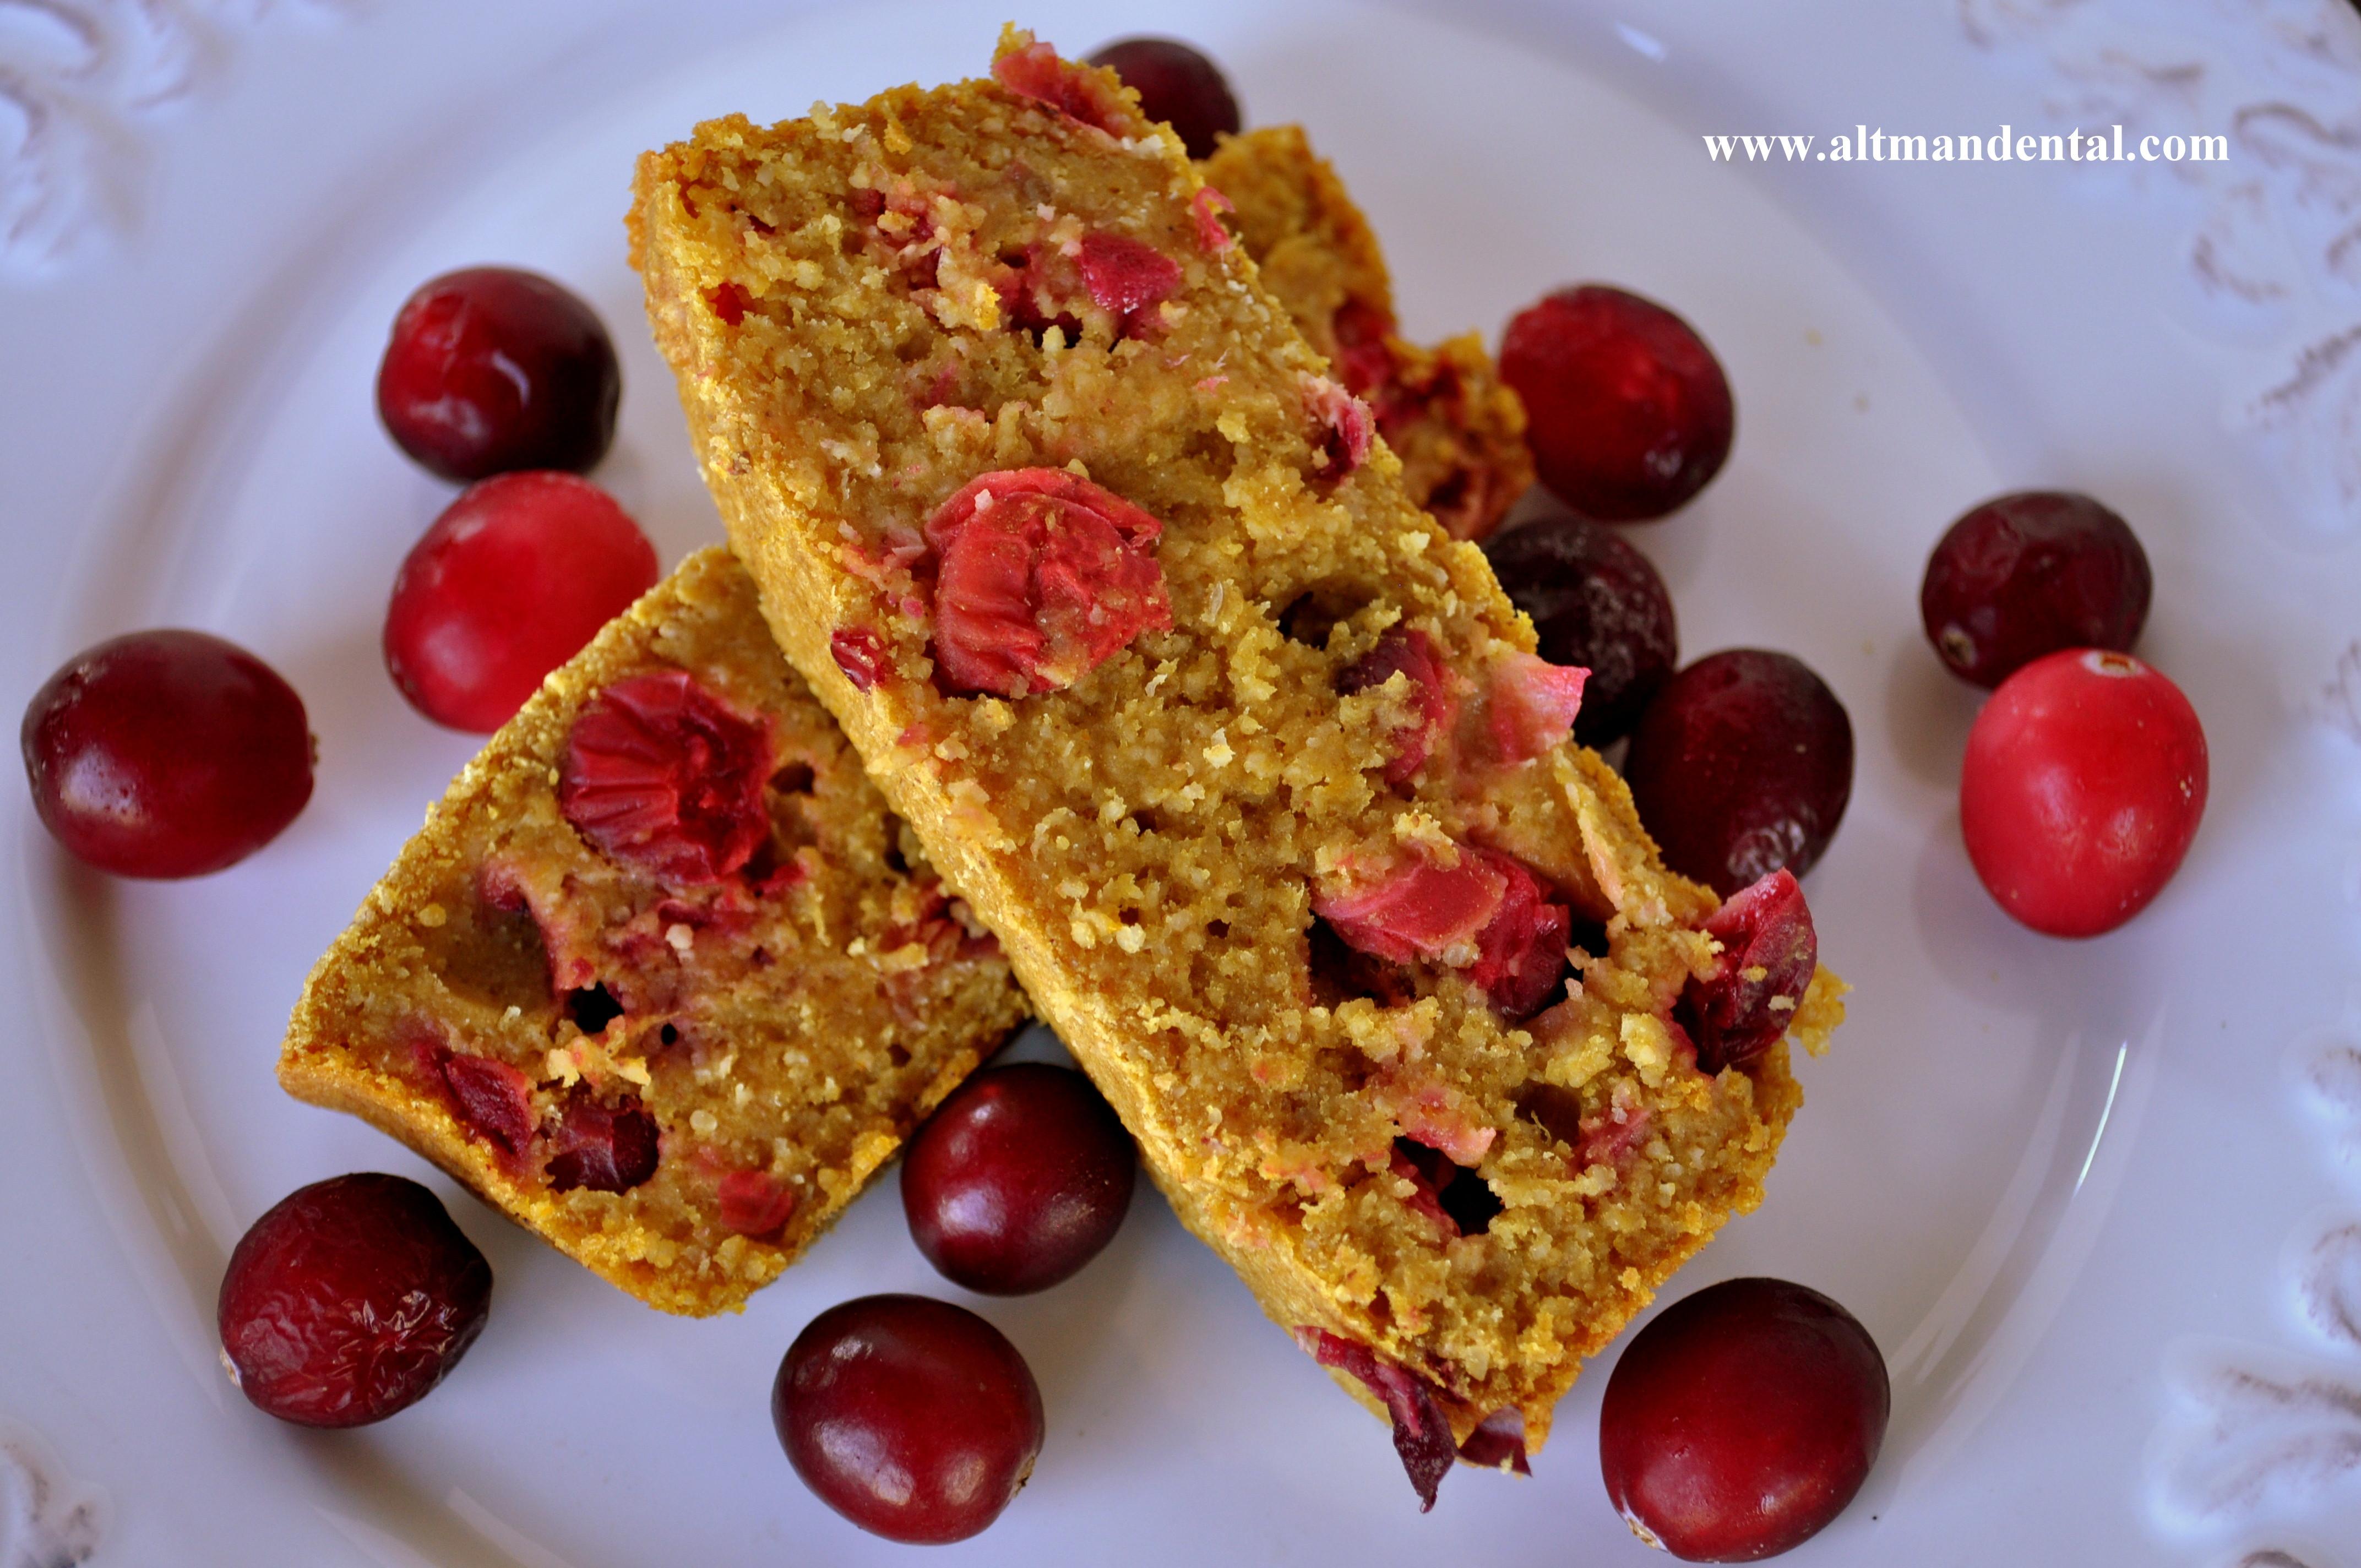 Healthy Pumpkin Cranberry Bread  Pumpkin Cranberry Bread Gluten & Dairy Free Made With Oat